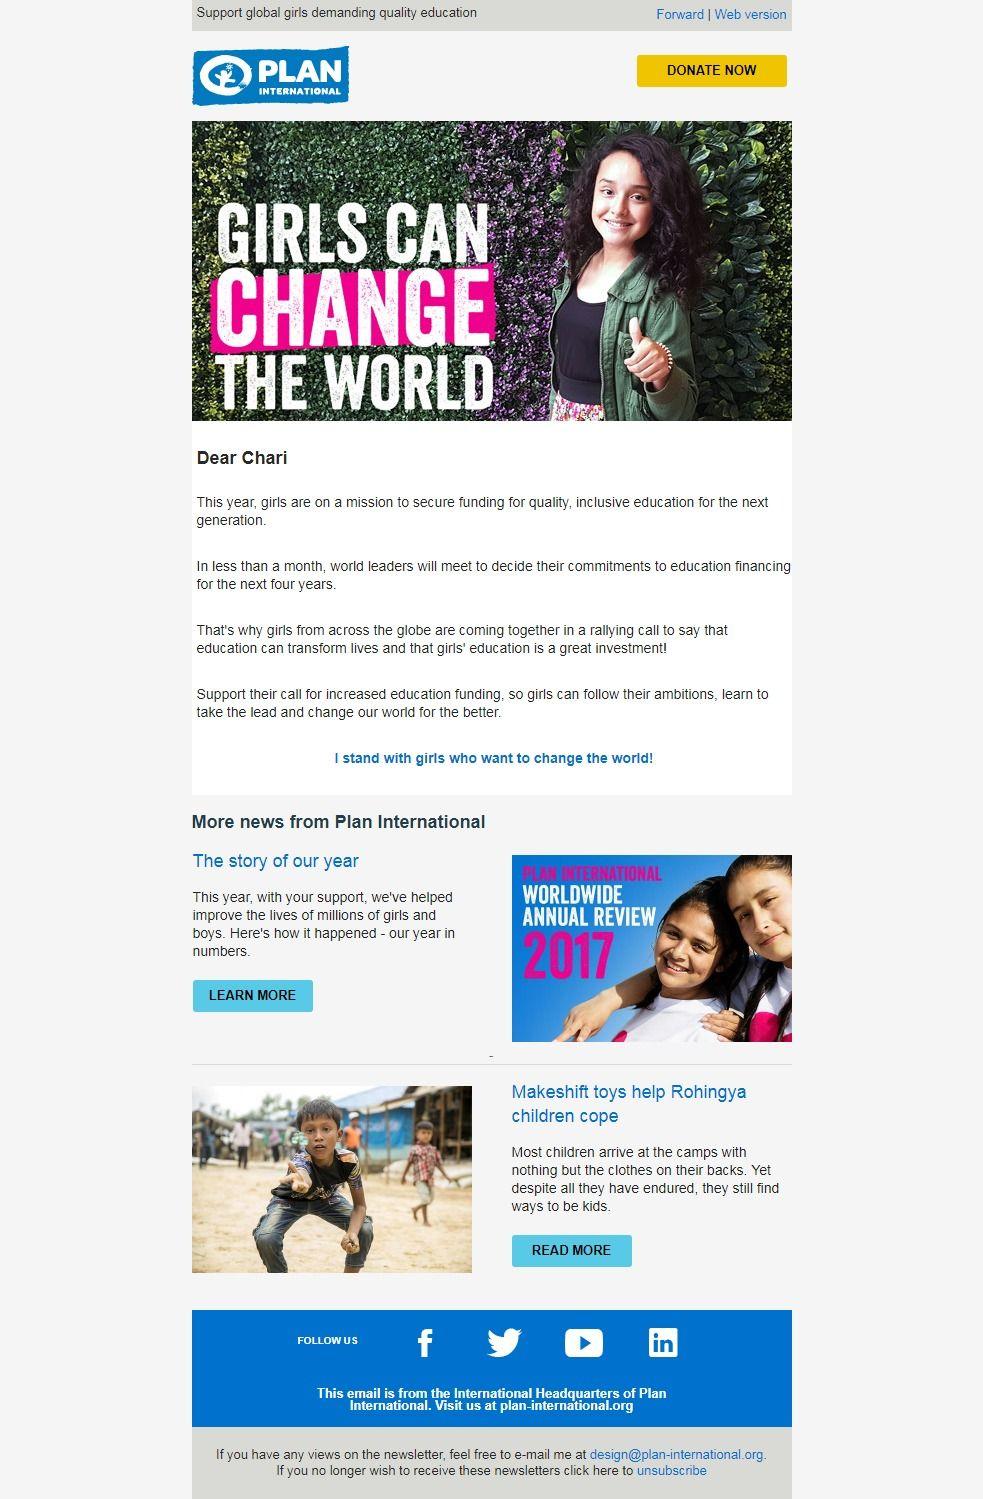 Plan International: Girls can change the world | Newsletter